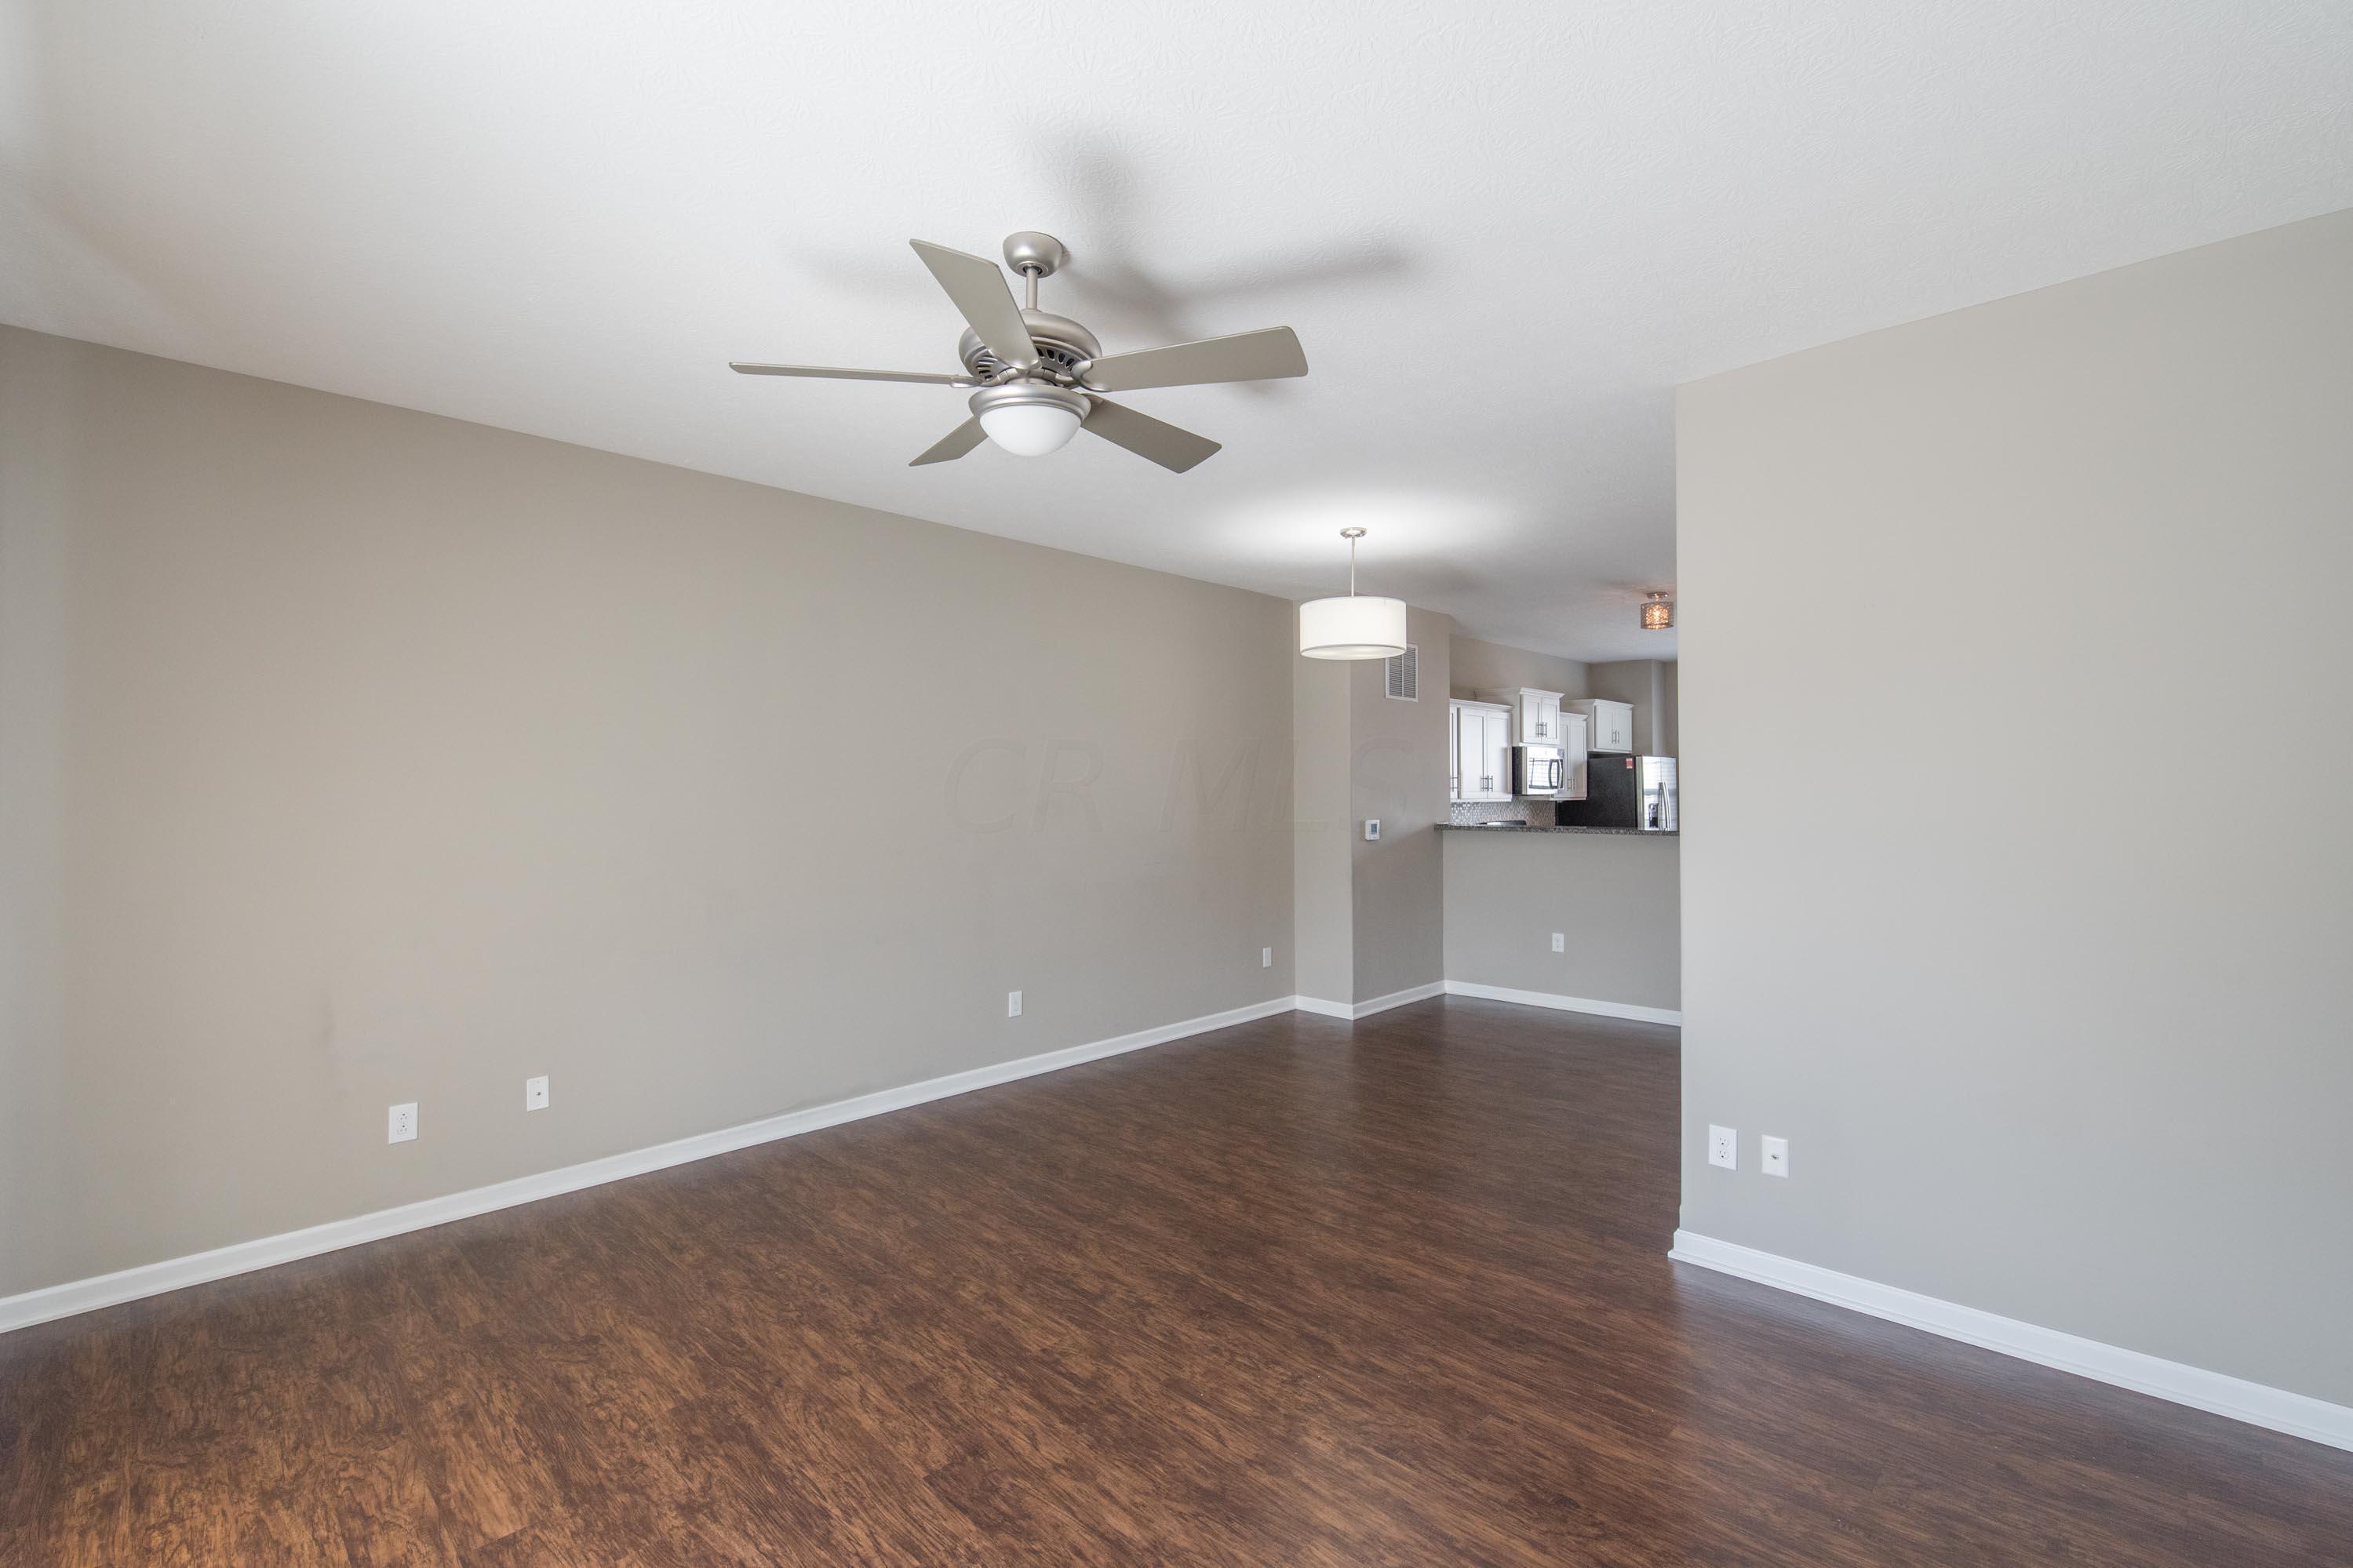 5727 Passage Creek Drive, Dublin, Ohio 43016, 2 Bedrooms Bedrooms, ,3 BathroomsBathrooms,Residential,For Sale,Passage Creek,220025690